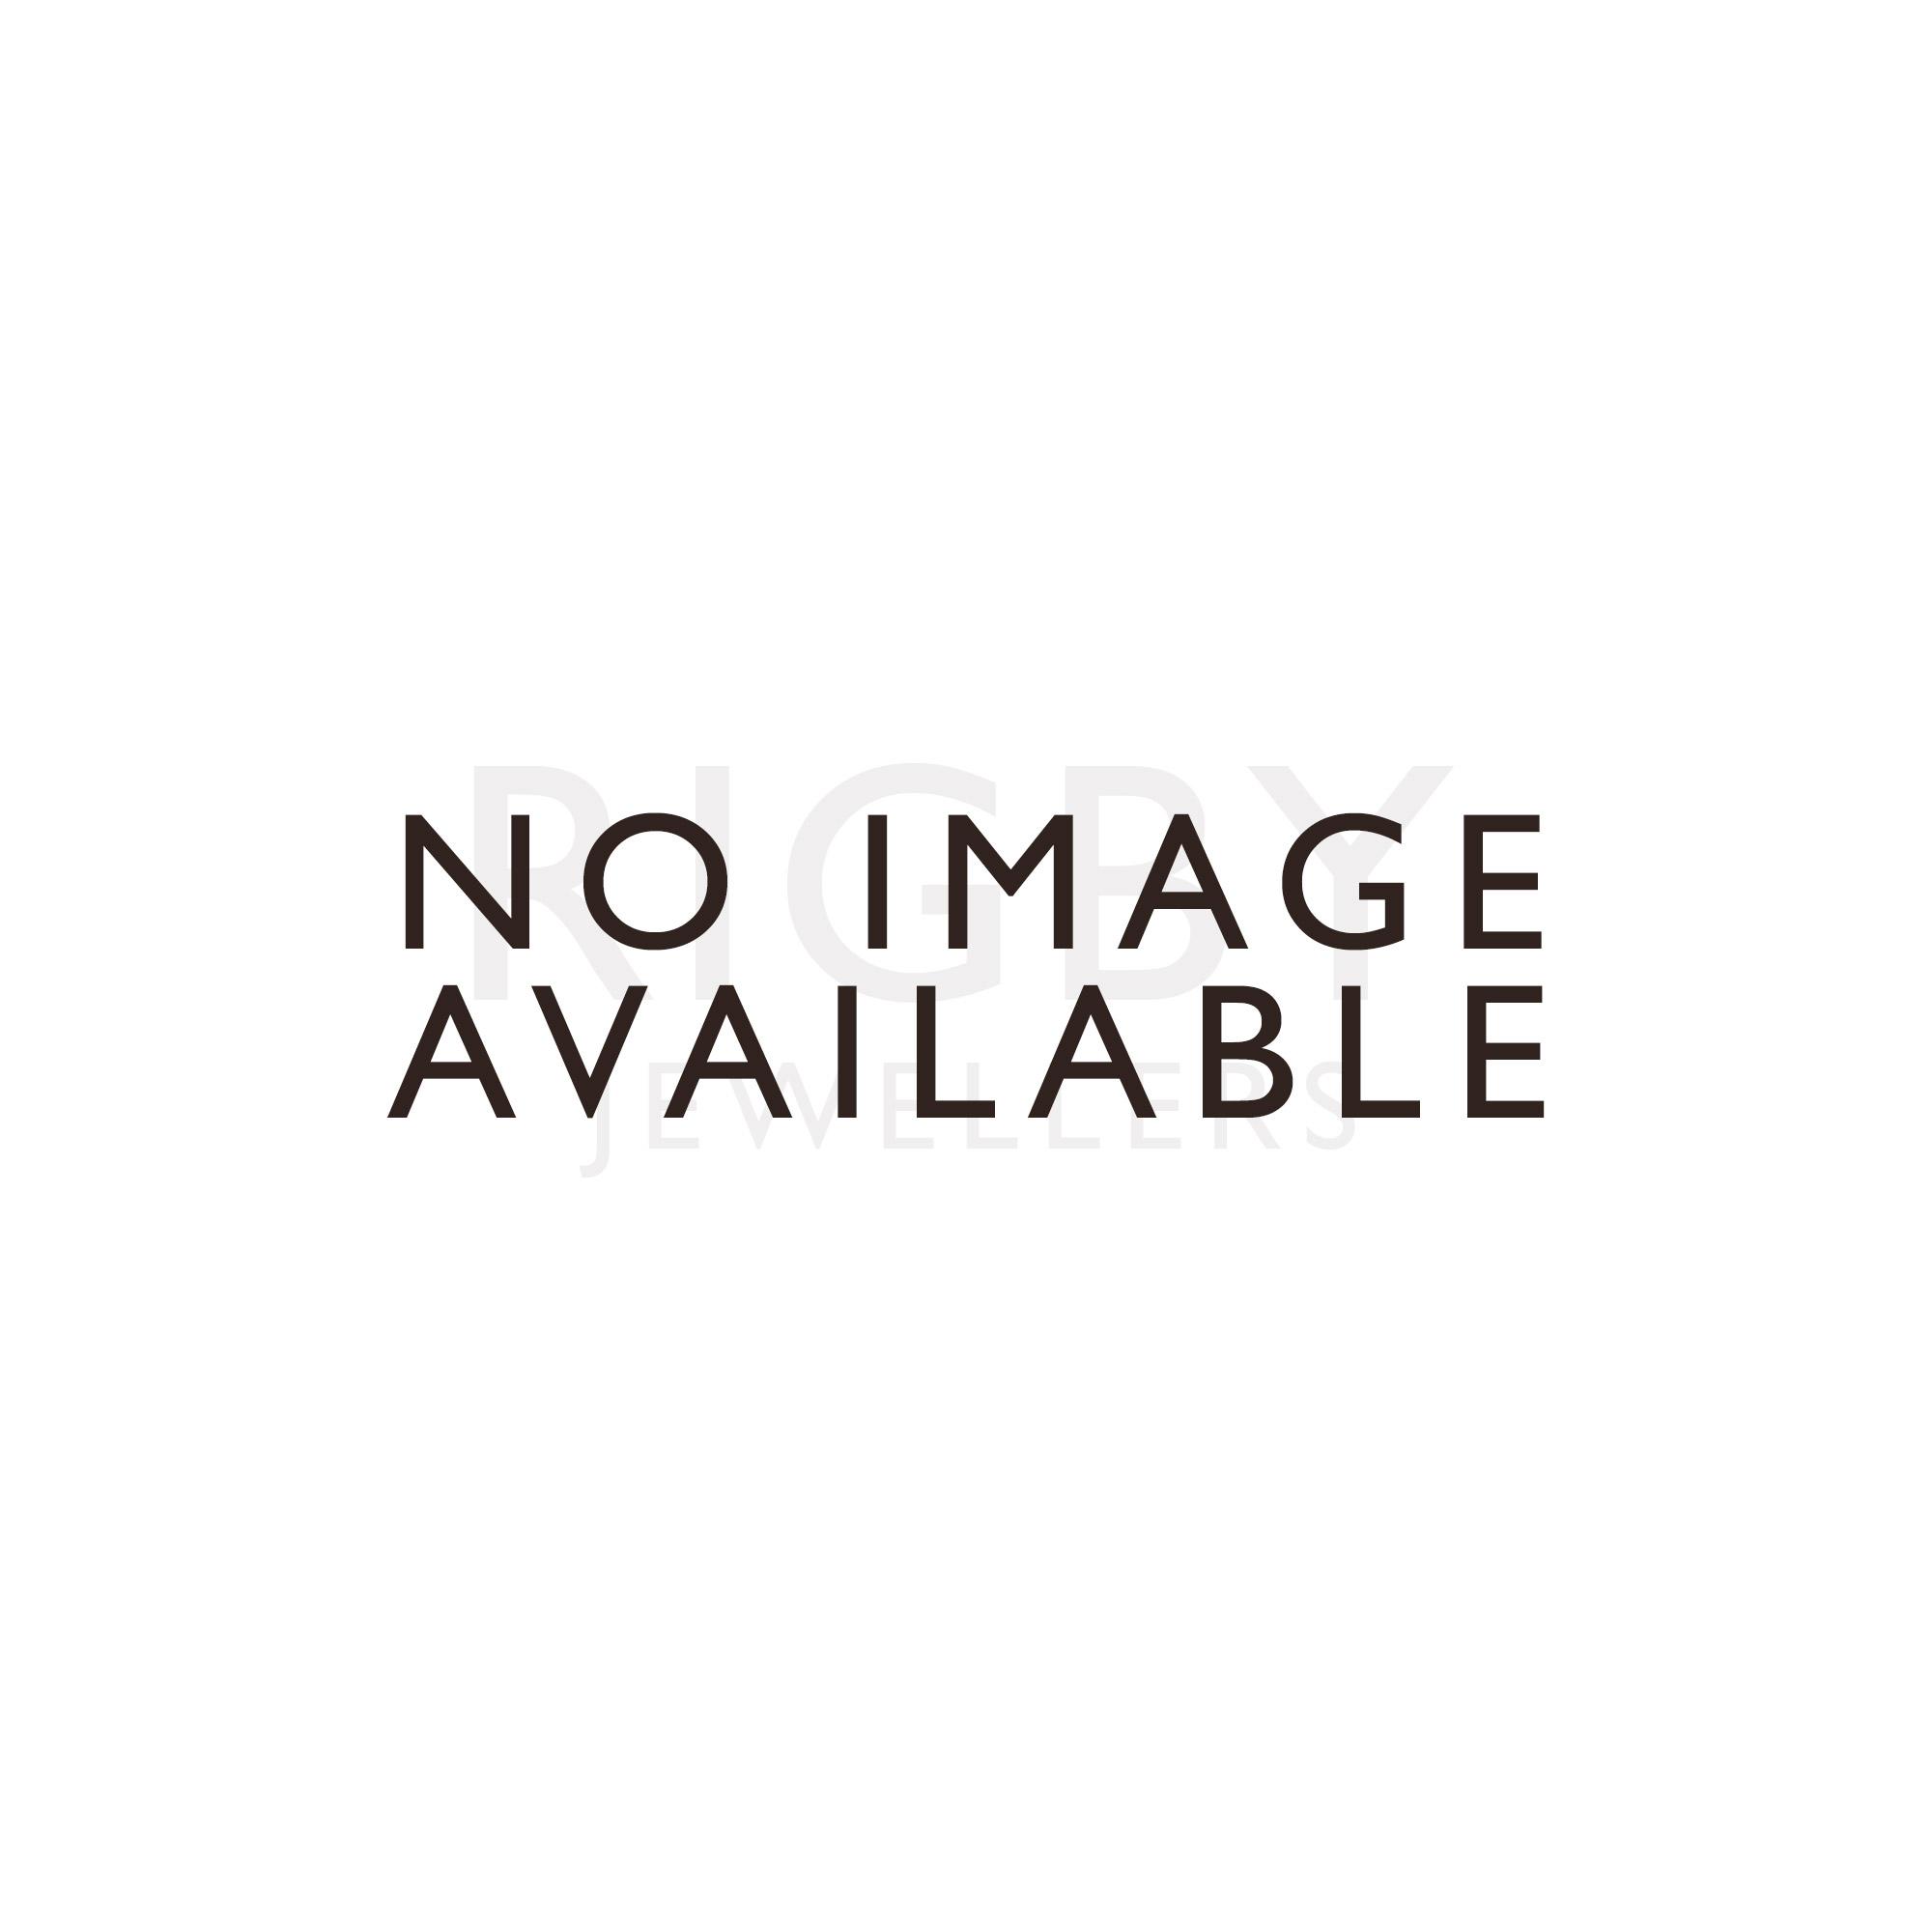 fba2cc58719e6 Clogau Windsor Limited Edition 2018 Gold Pearl Earrings WNPRSE